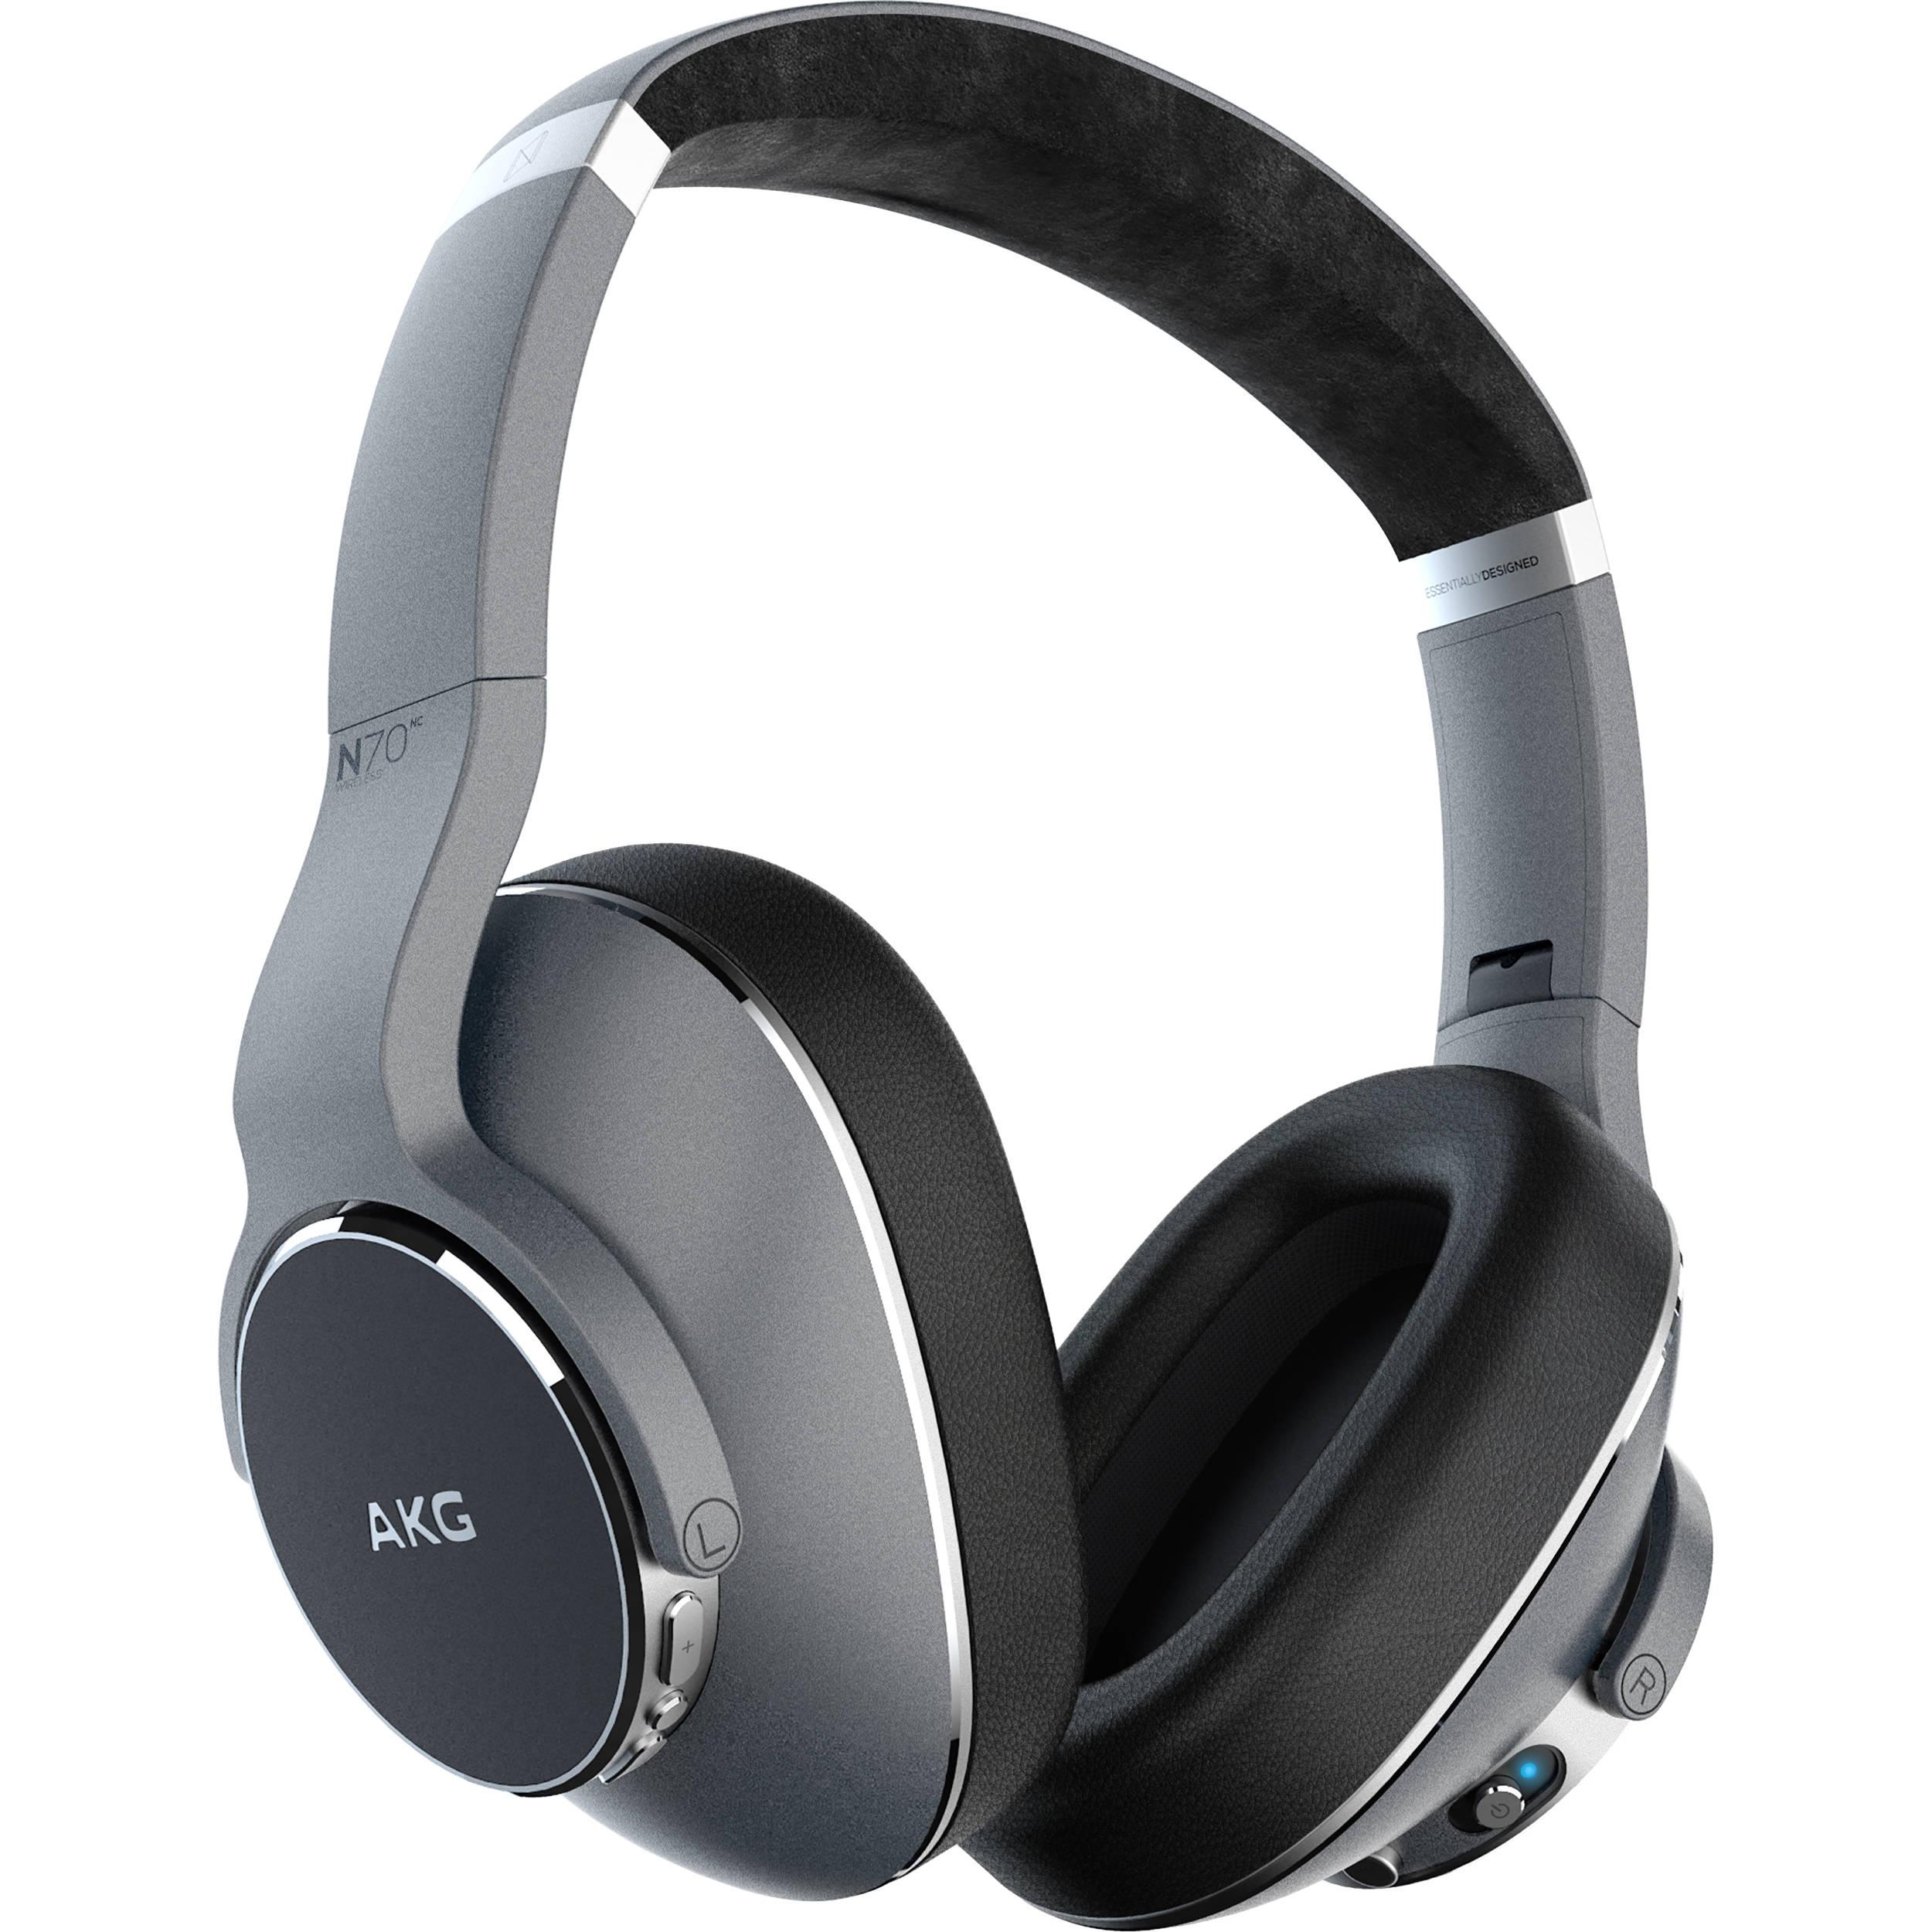 AKG N700NC Adaptive Noise Cancelling Over-Ear Wireless Headphones